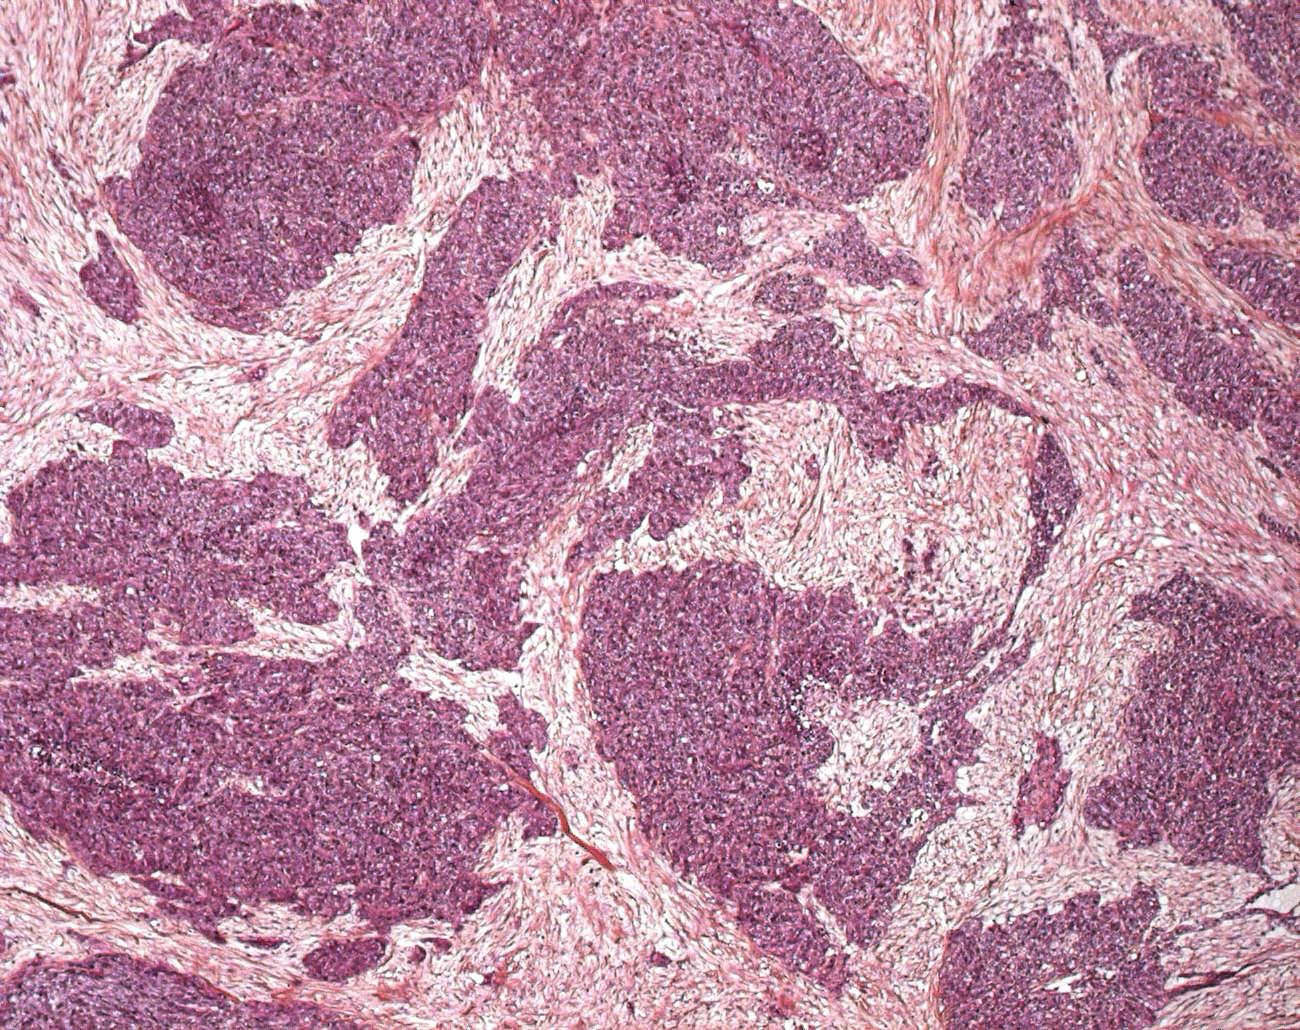 Abdominal Desmoplastic Small Round Cell Tumor